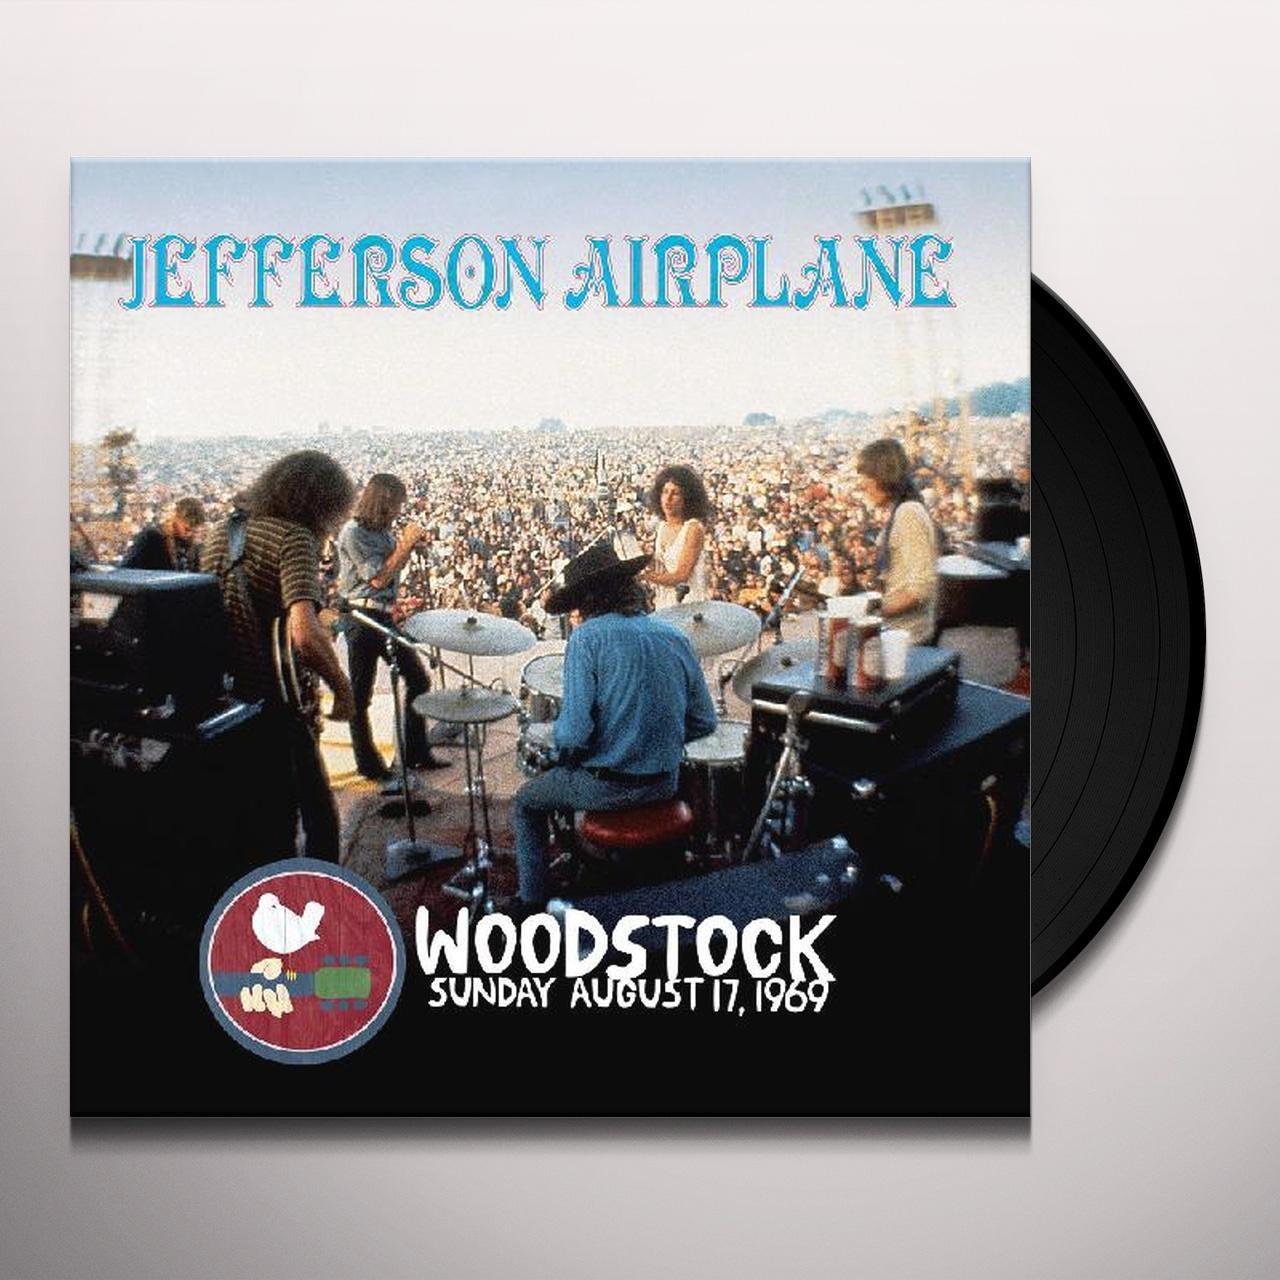 Jefferson Airplane WOODSTOCK SUNDAY AUGUST 17,1969 Vinyl Record